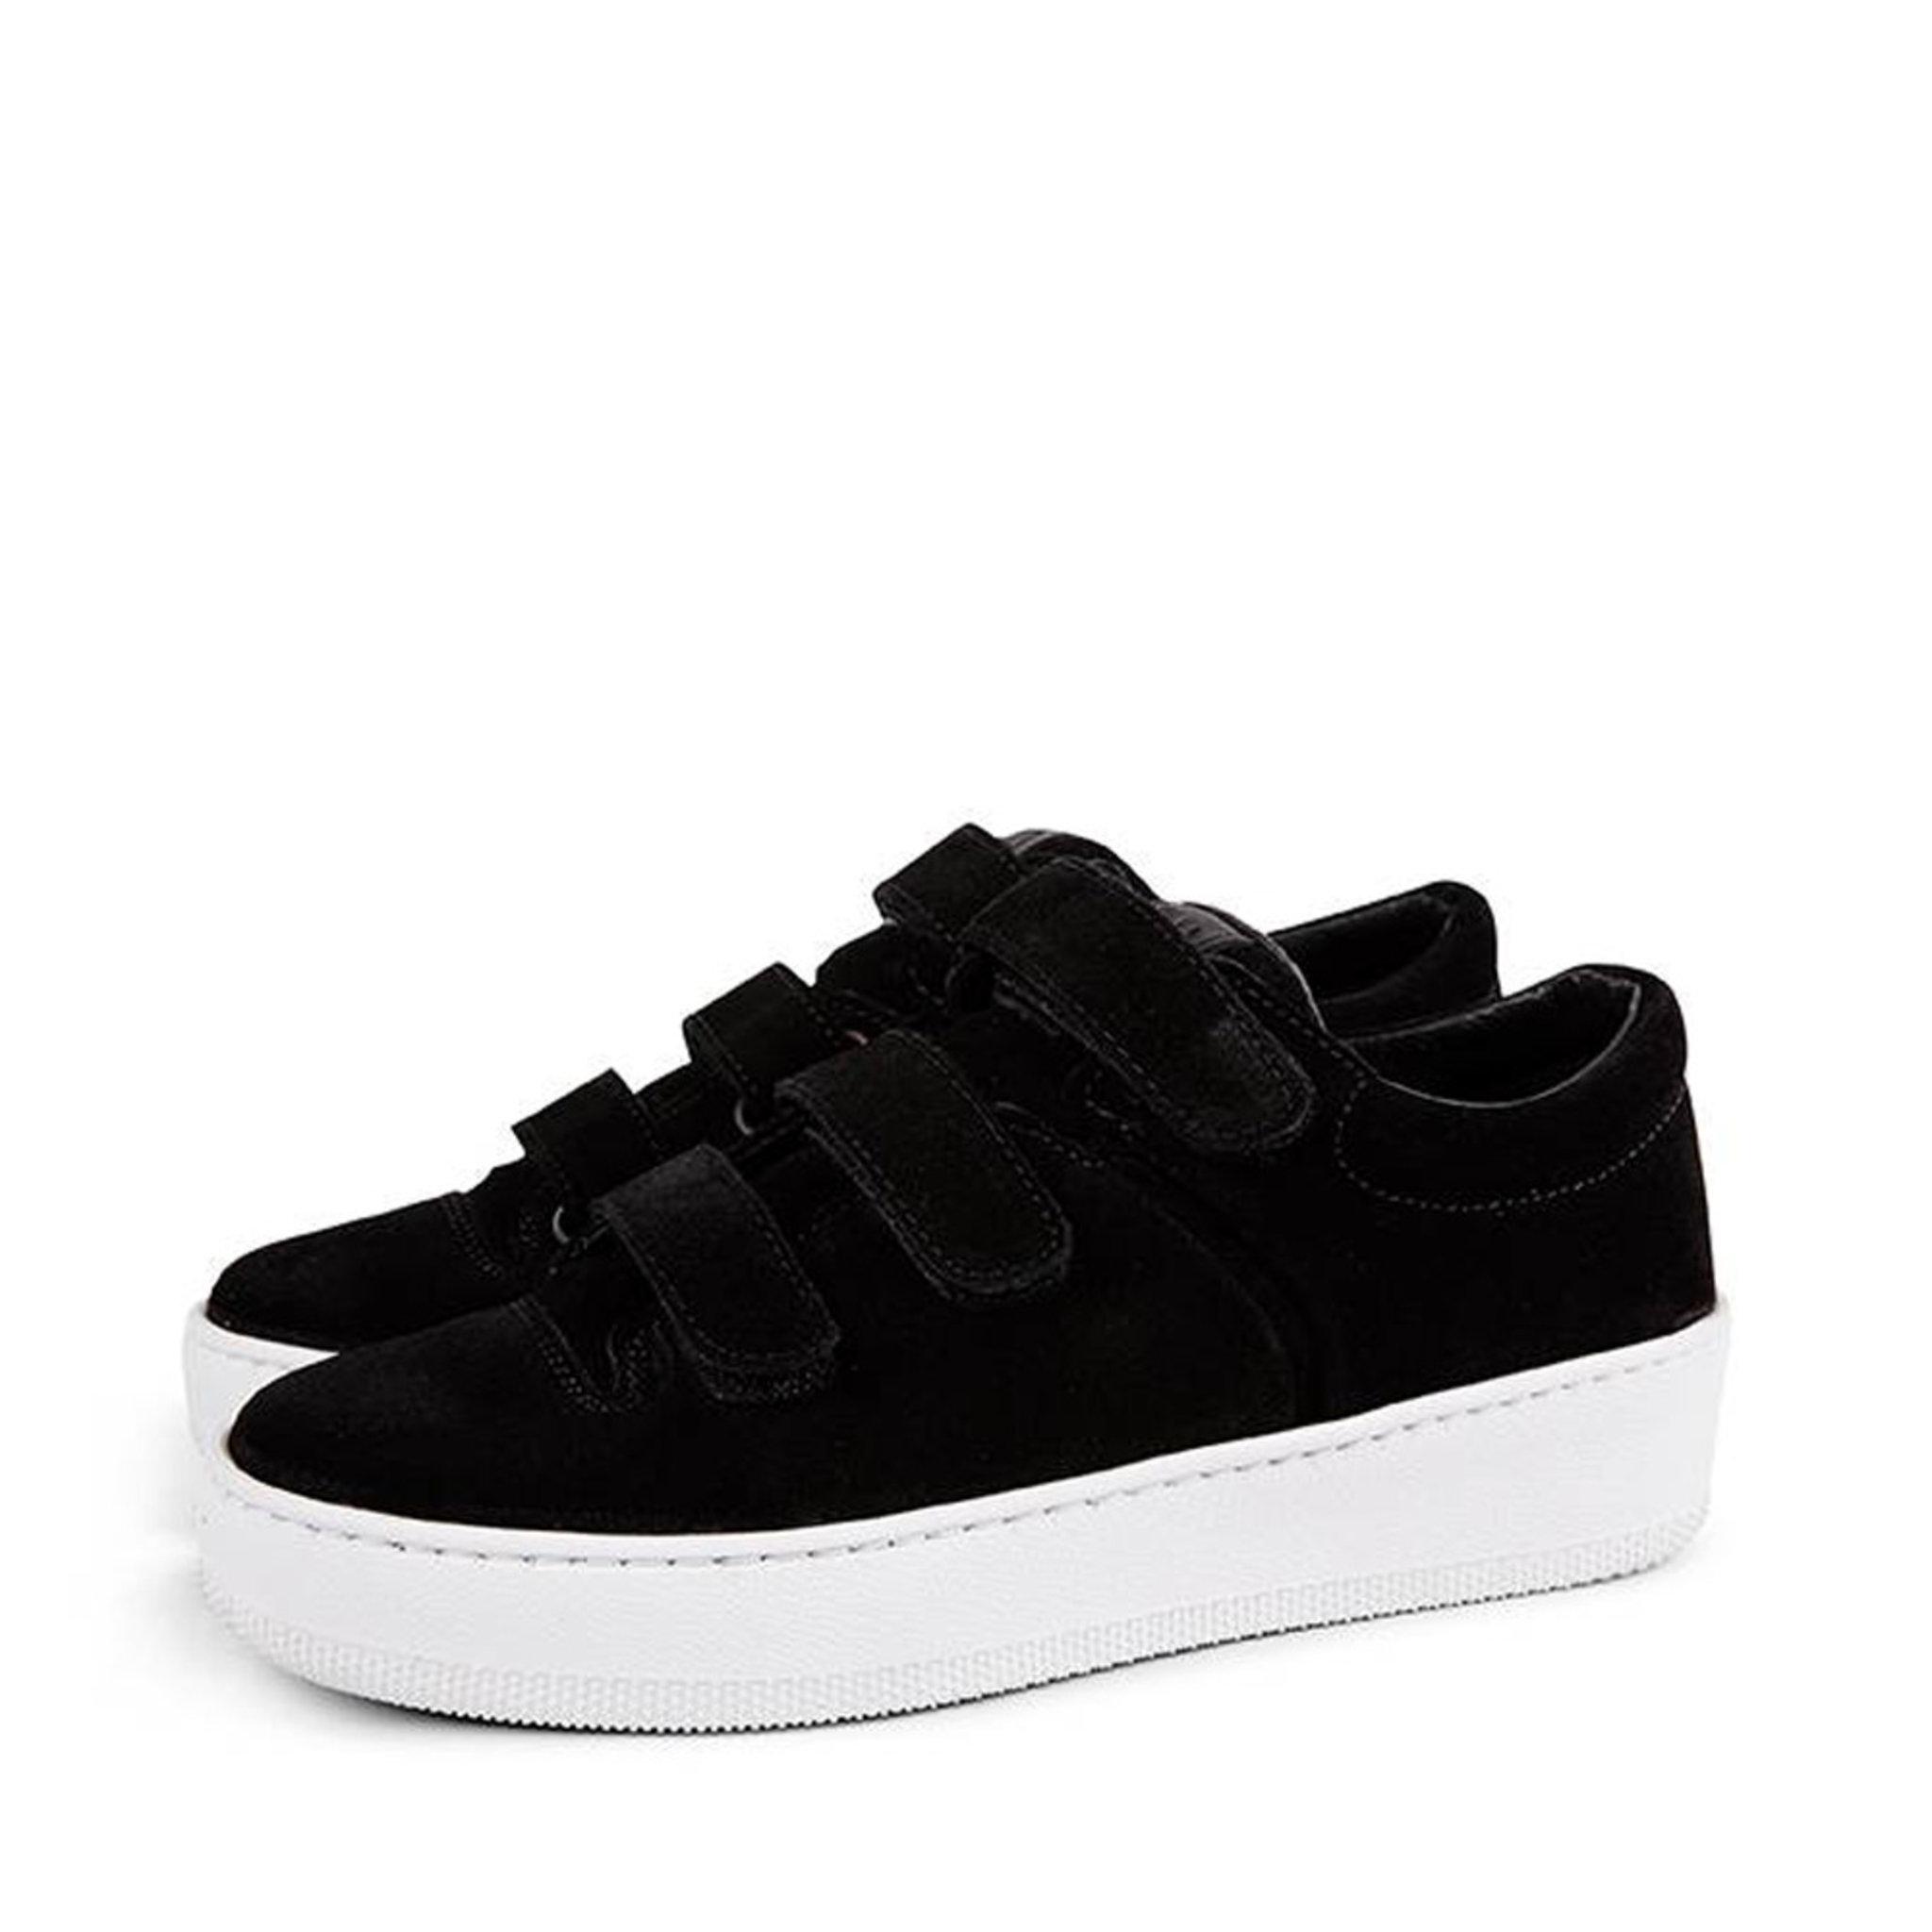 3777d768 Cloud Fat Velcro - Sneakers - Köp online på åhlens.se!